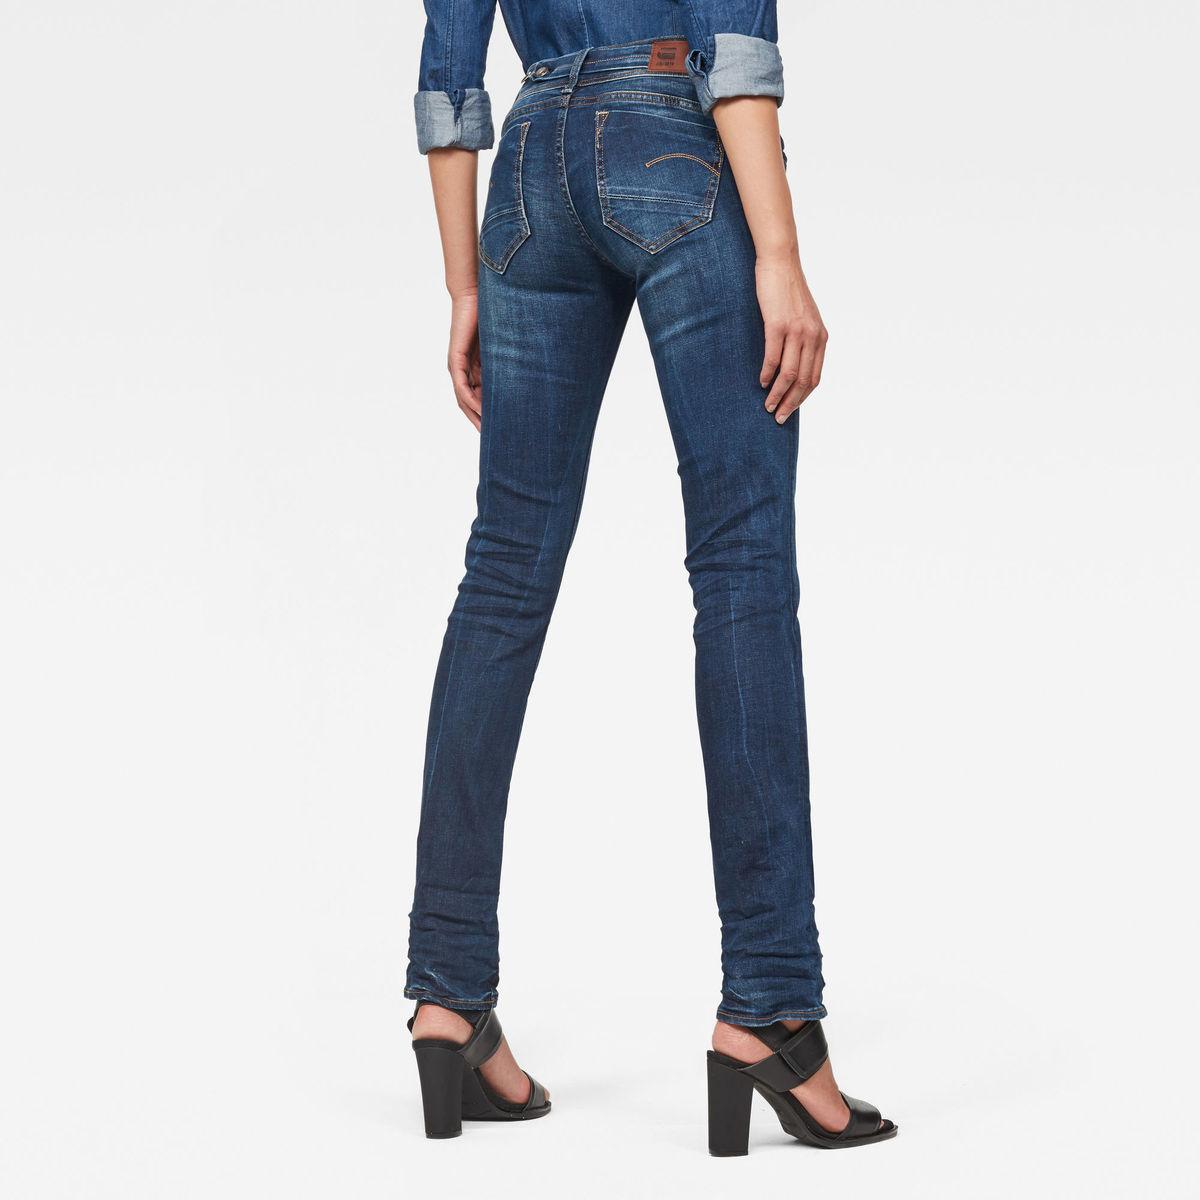 Bild 2 von Midge Saddle Mid Waist Straight Jeans